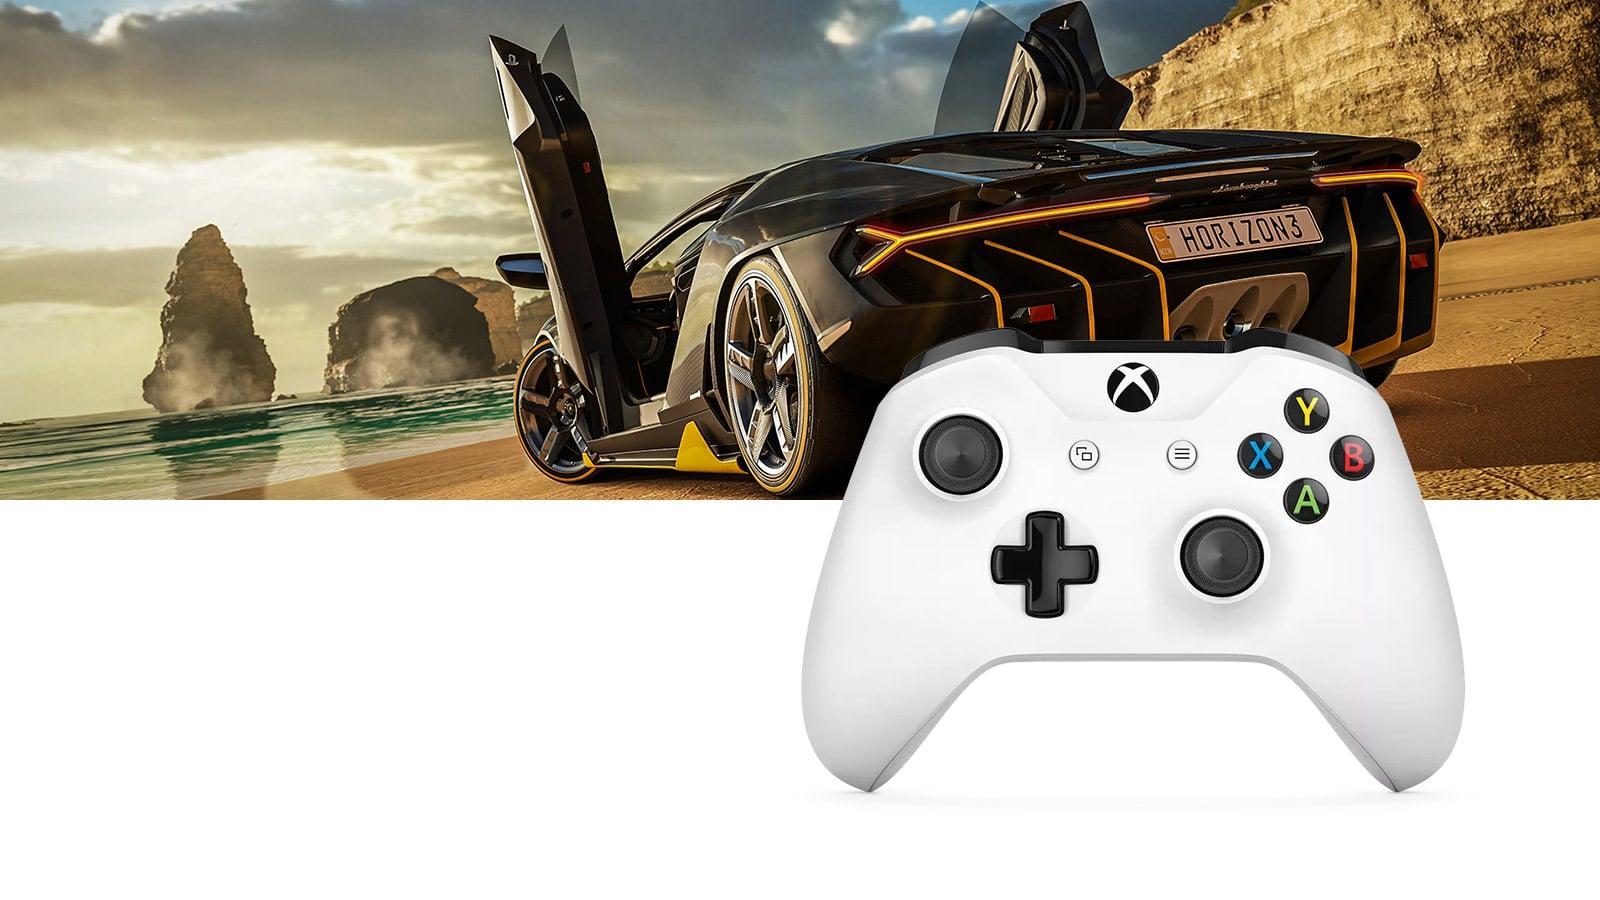 Forza가 보이는 Xbox 및 흰색 컨트롤러